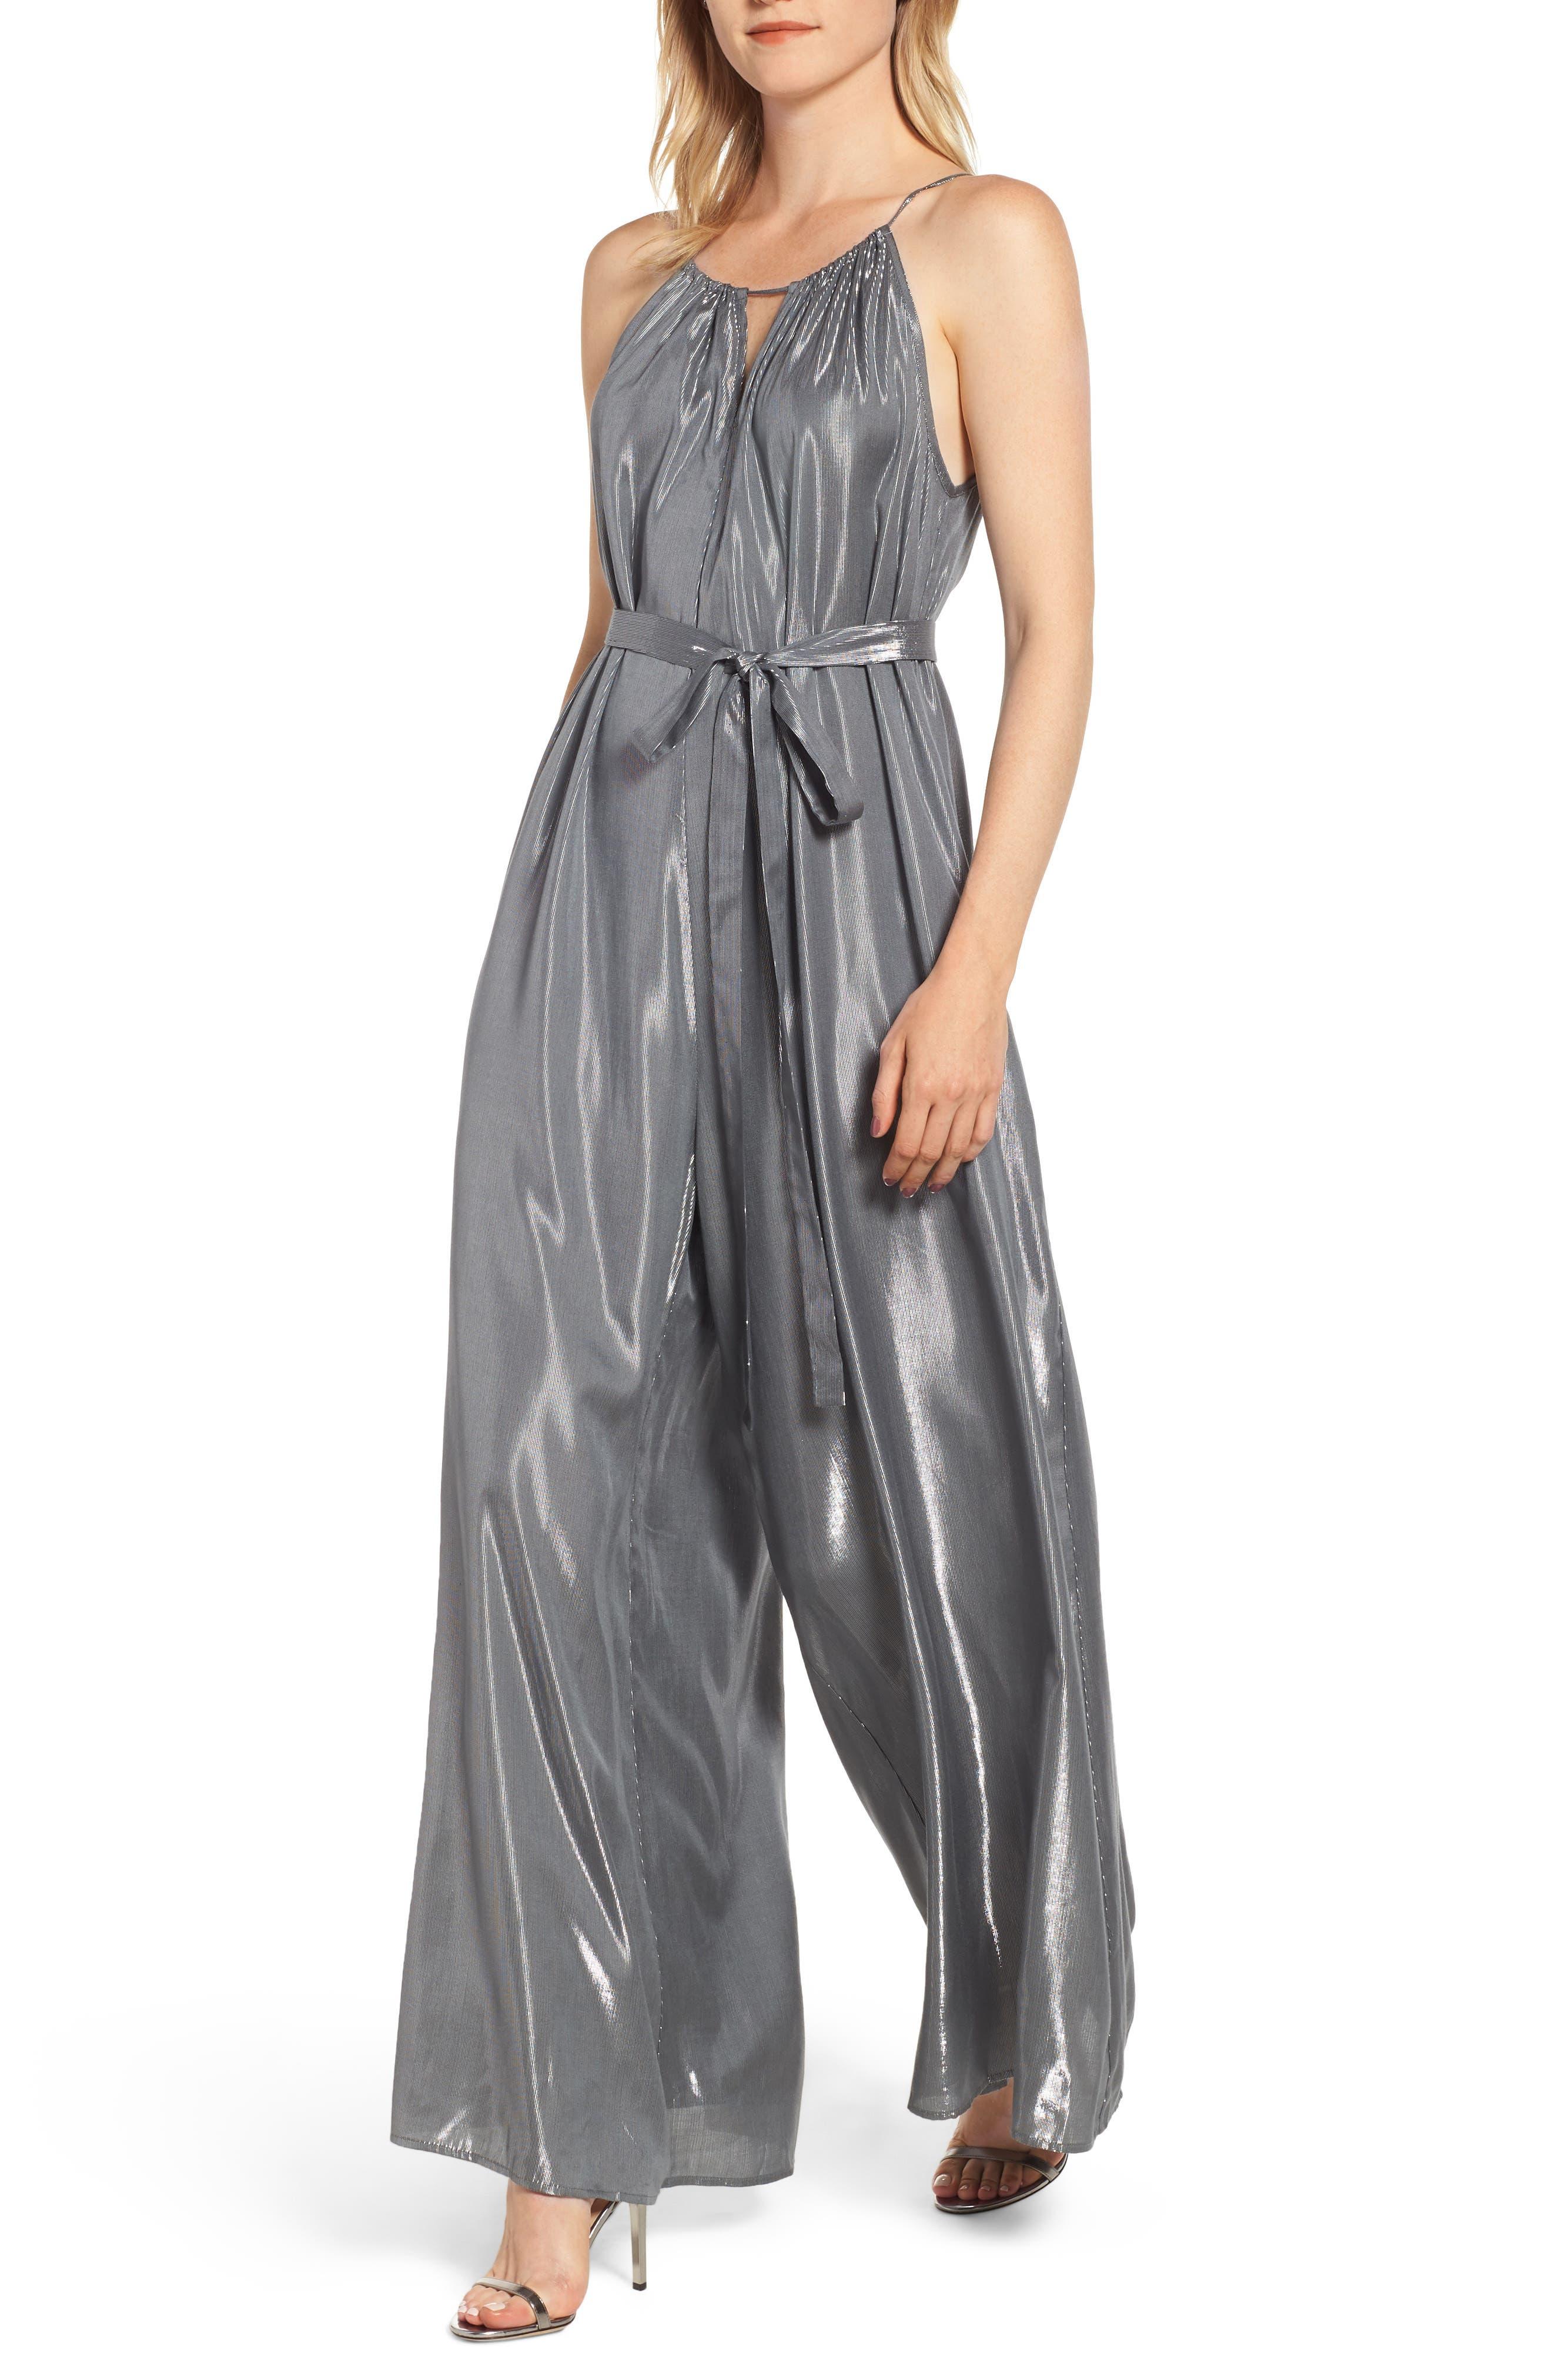 1960s – 70s Cocktail, Party, Prom, Evening Dresses Womens Velvet By Graham  Spencer Lame Halter Jumpsuit Size X-Large - Metallic $249.00 AT vintagedancer.com